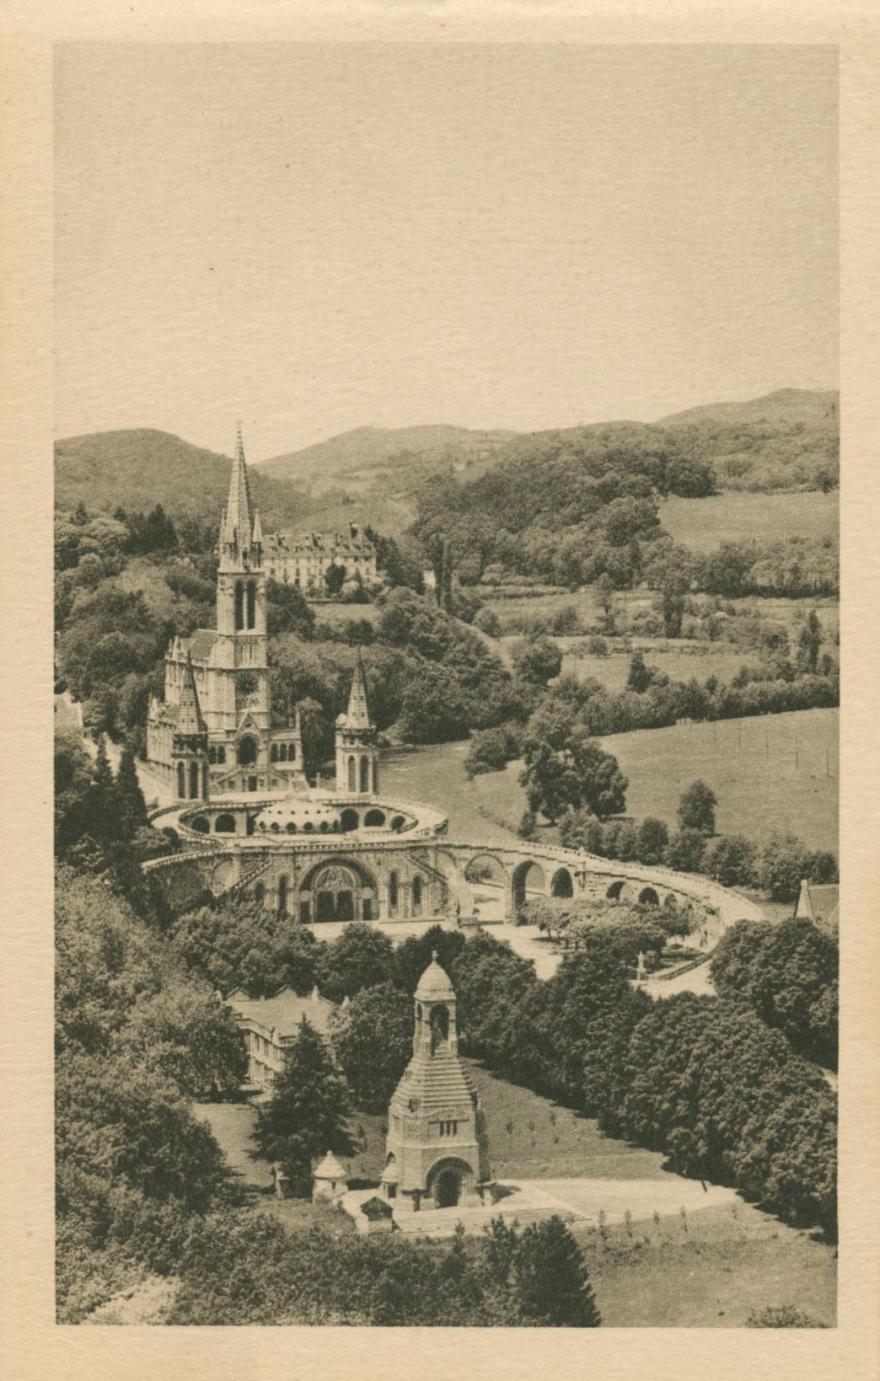 Lourdes_1937_Postcard1